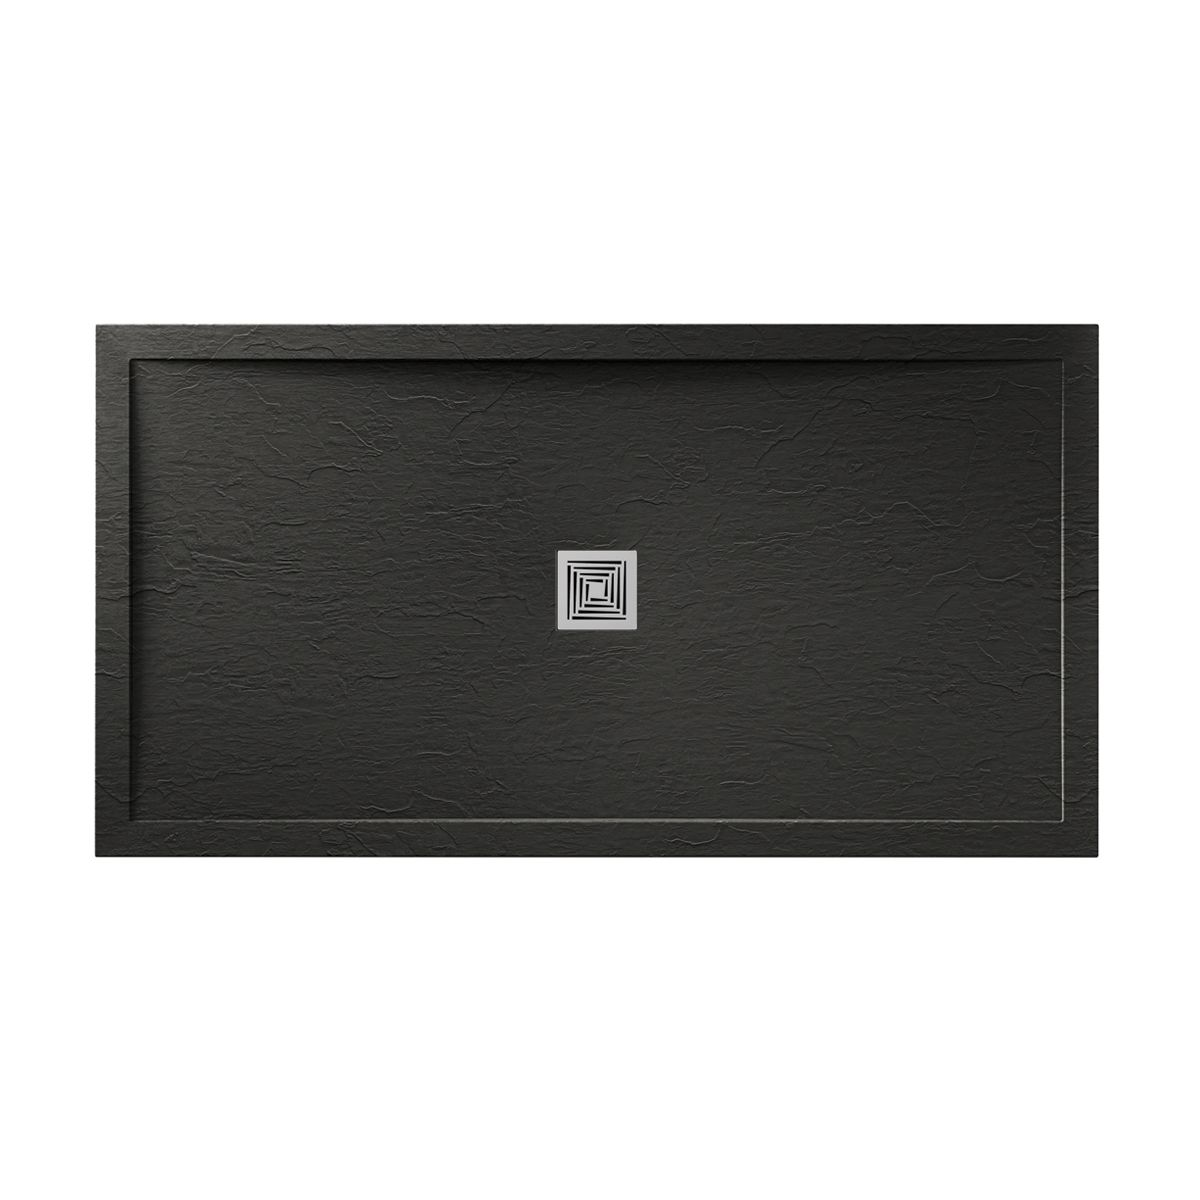 Aquadart Black Slate Shower Tray 1500 x 800